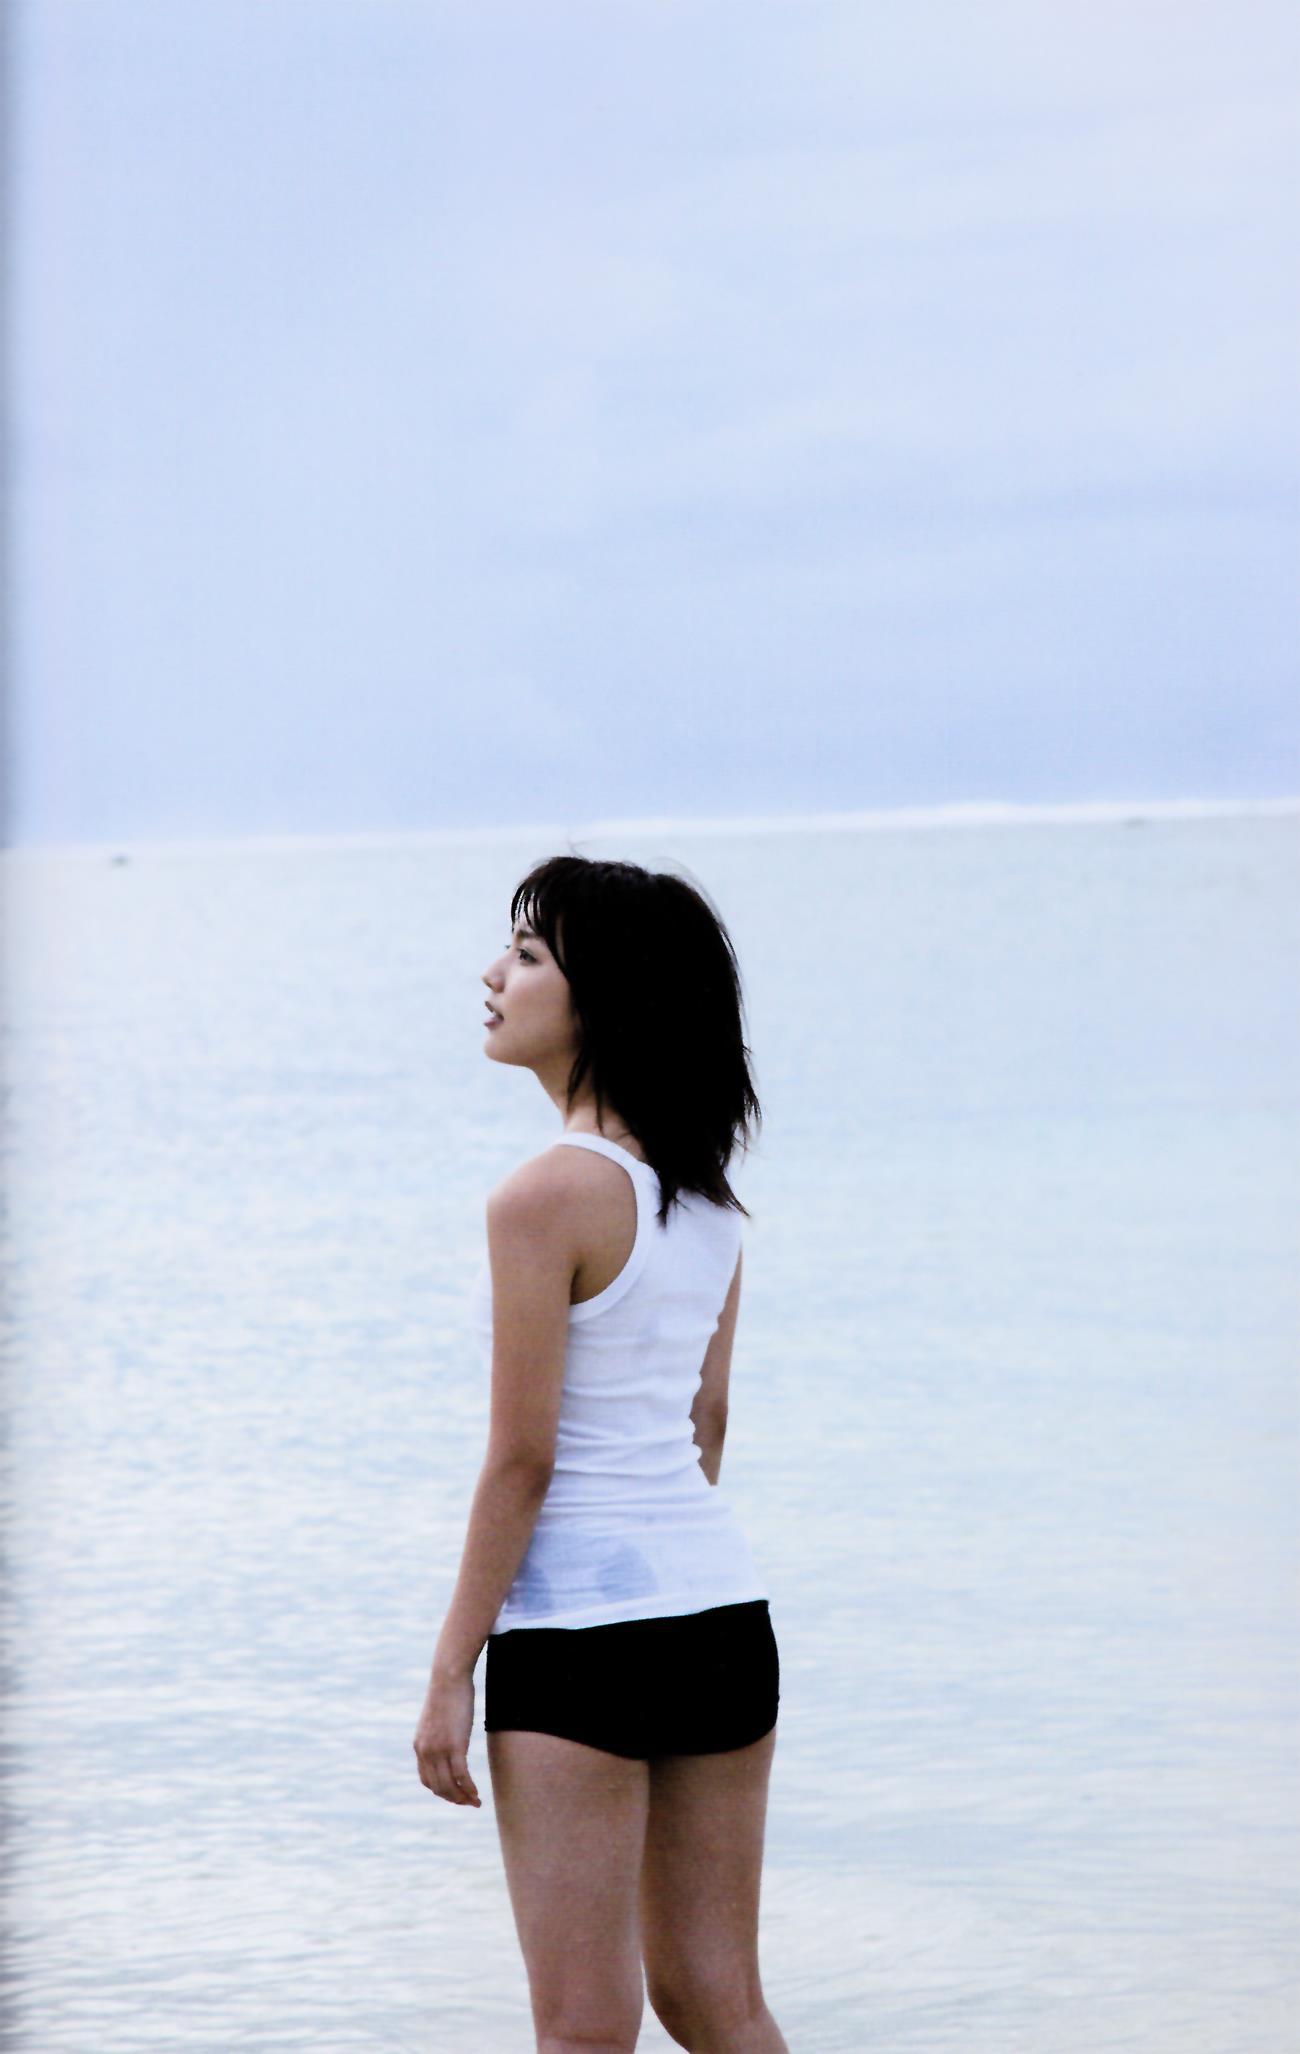 真野恵里菜 エロ画像 181